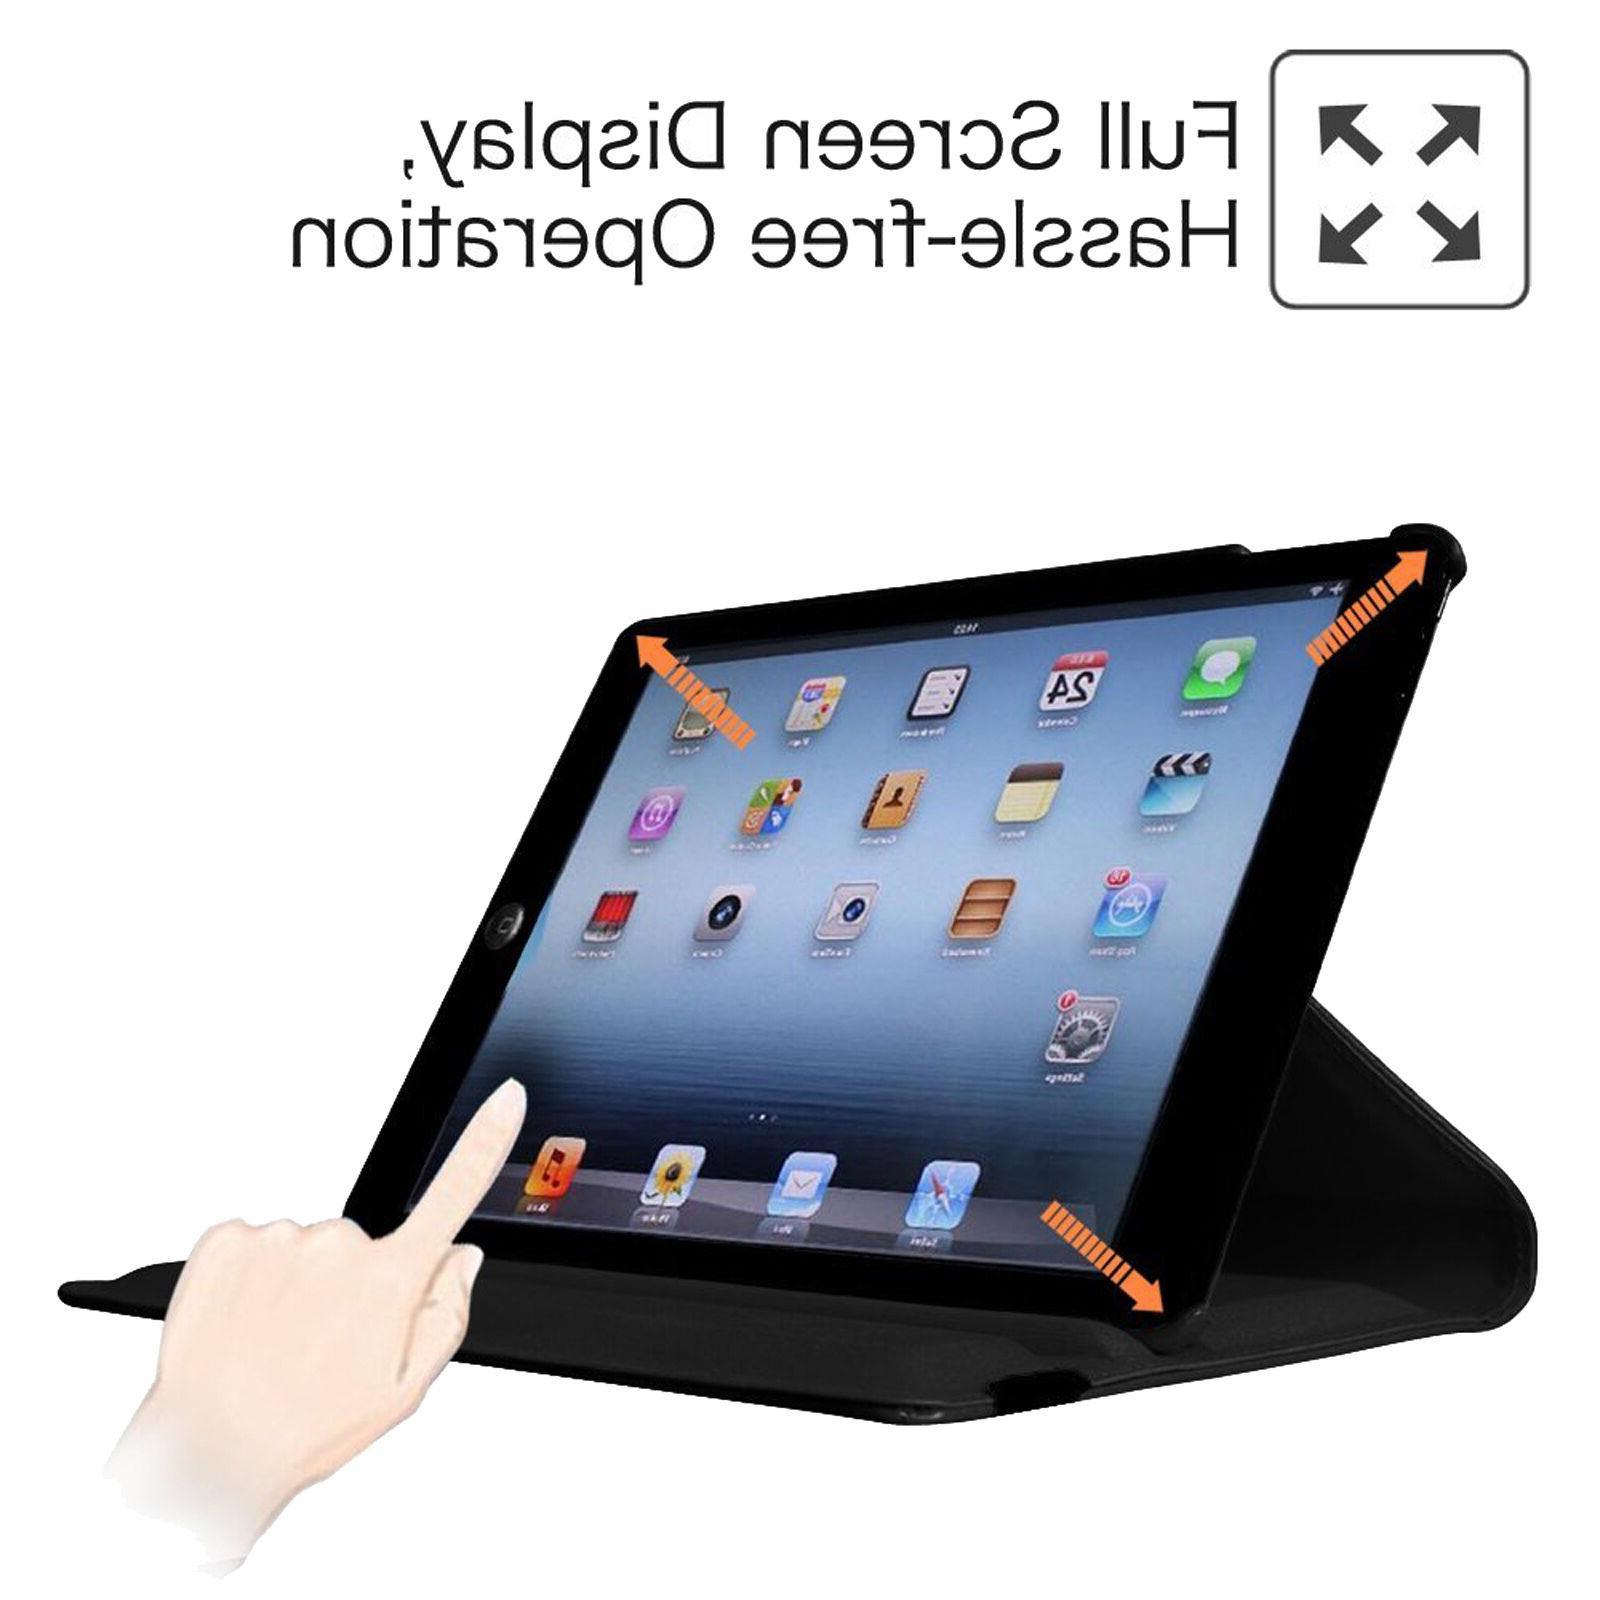 Rotating Stand iPad Case For iPad 2 5 Mini 2 3 1 Pro